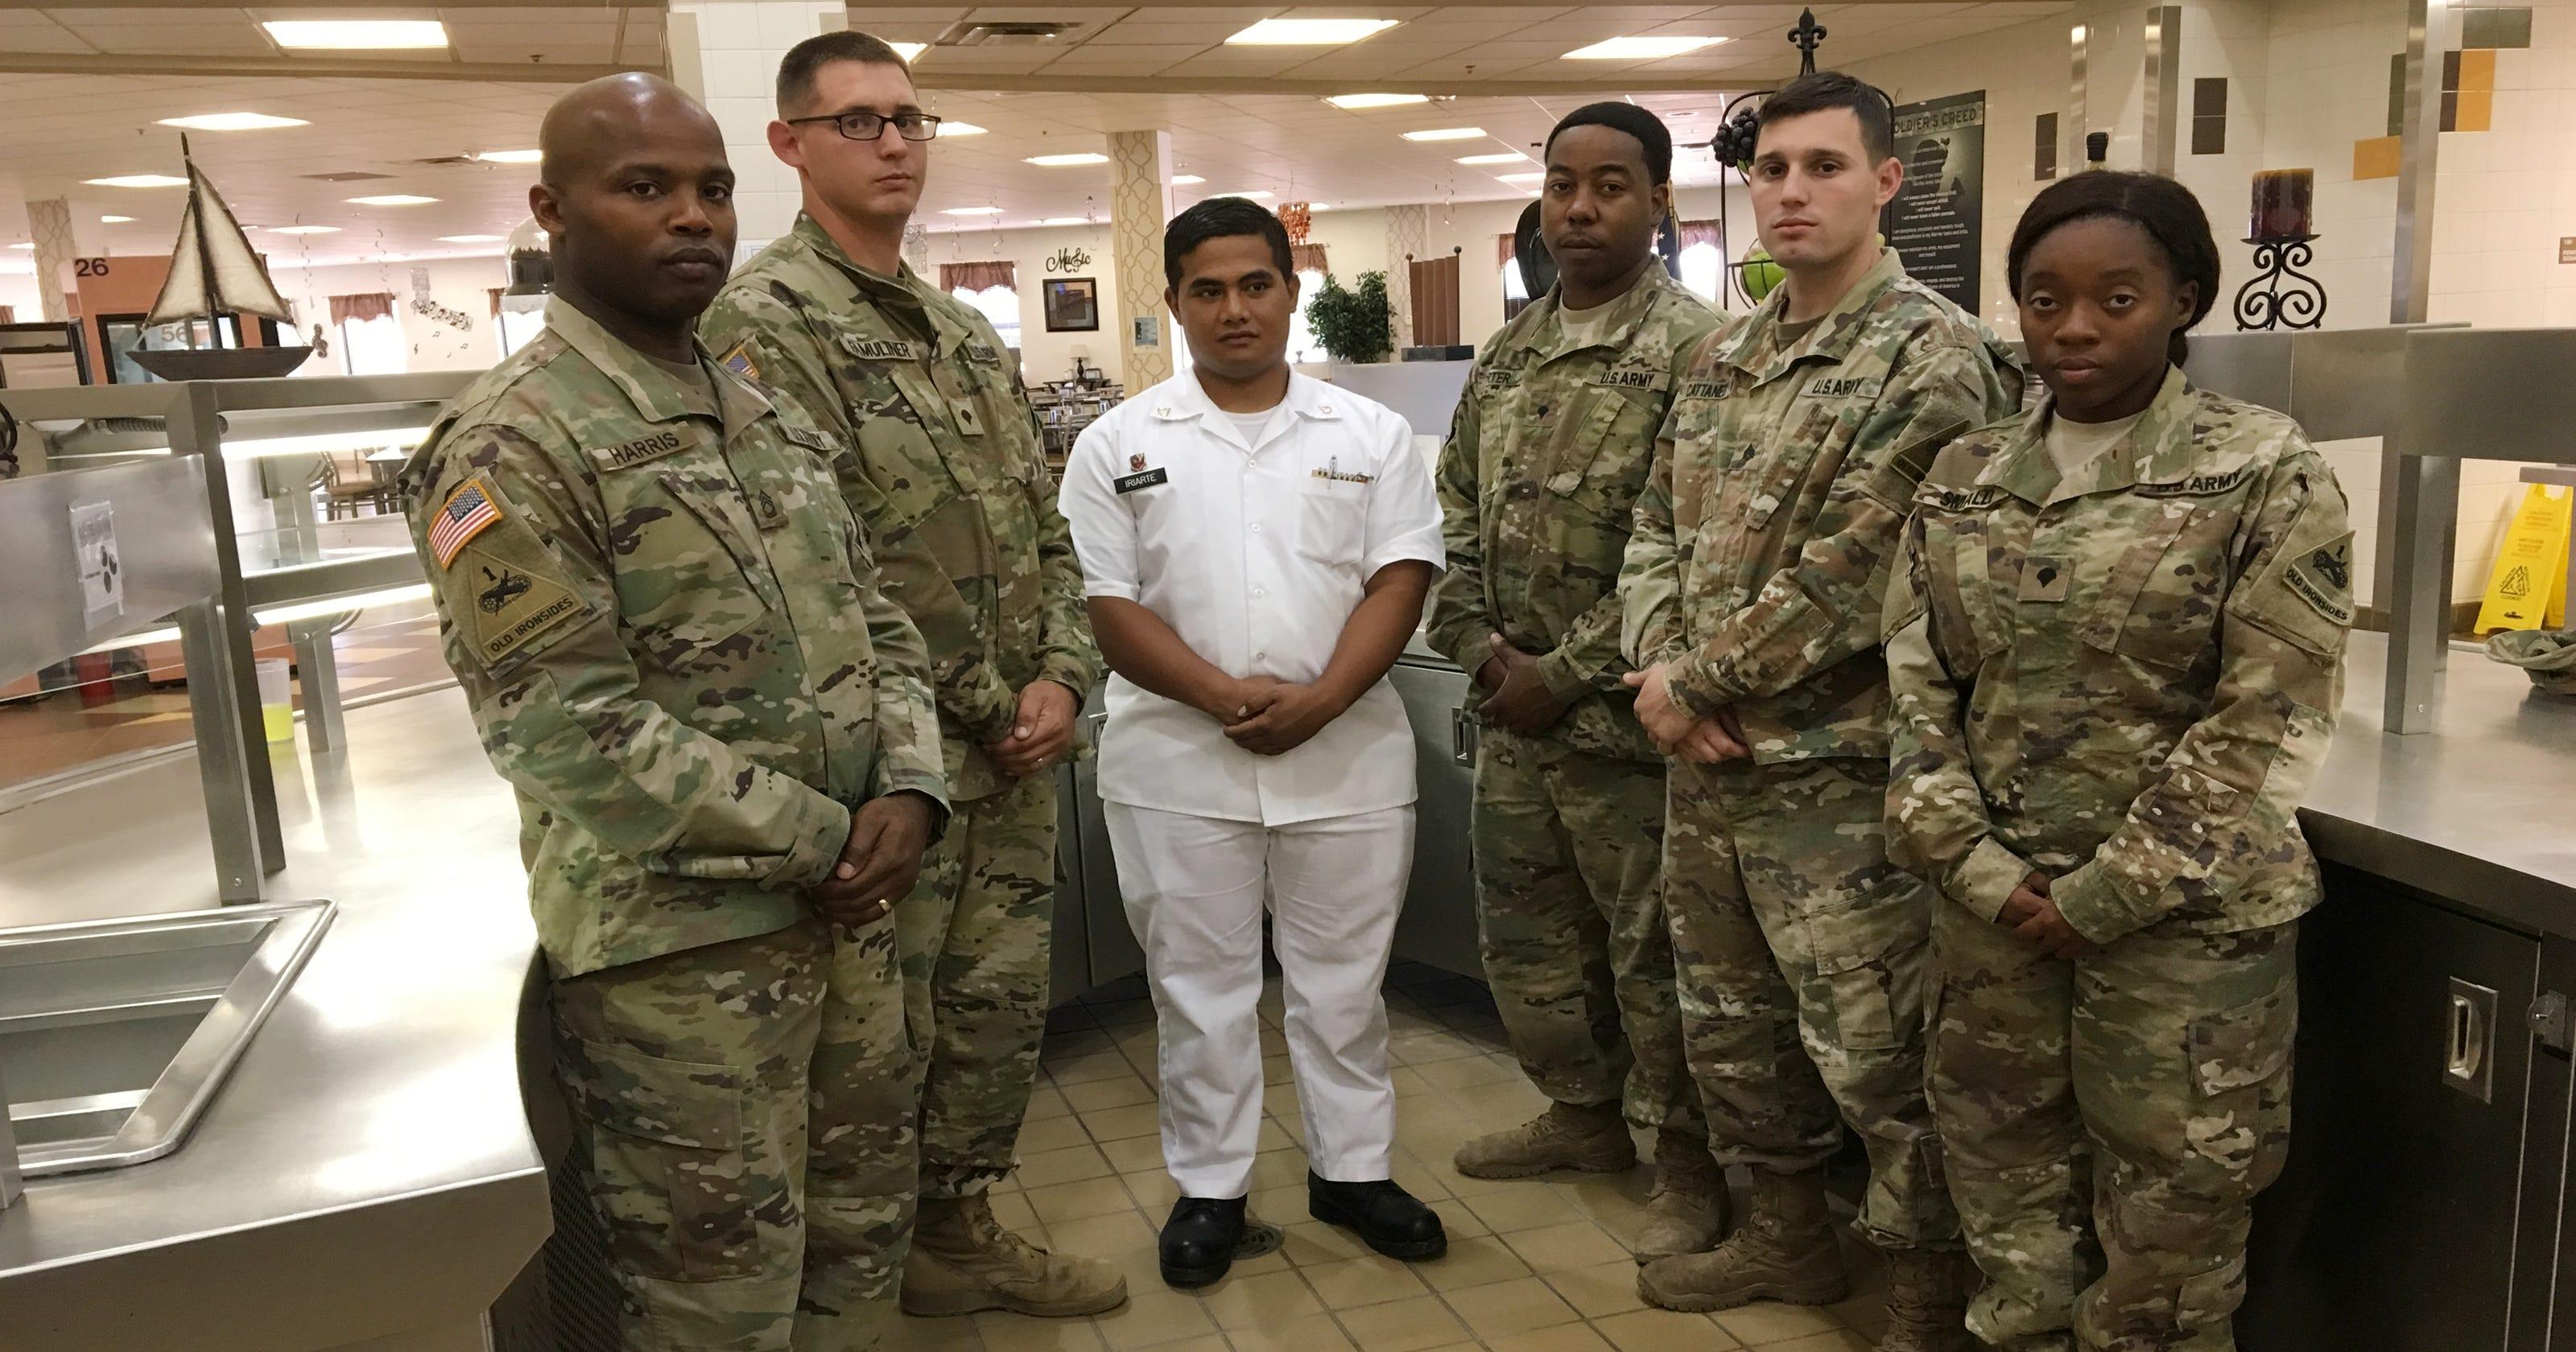 1st Brigade field kitchen team among best in Army